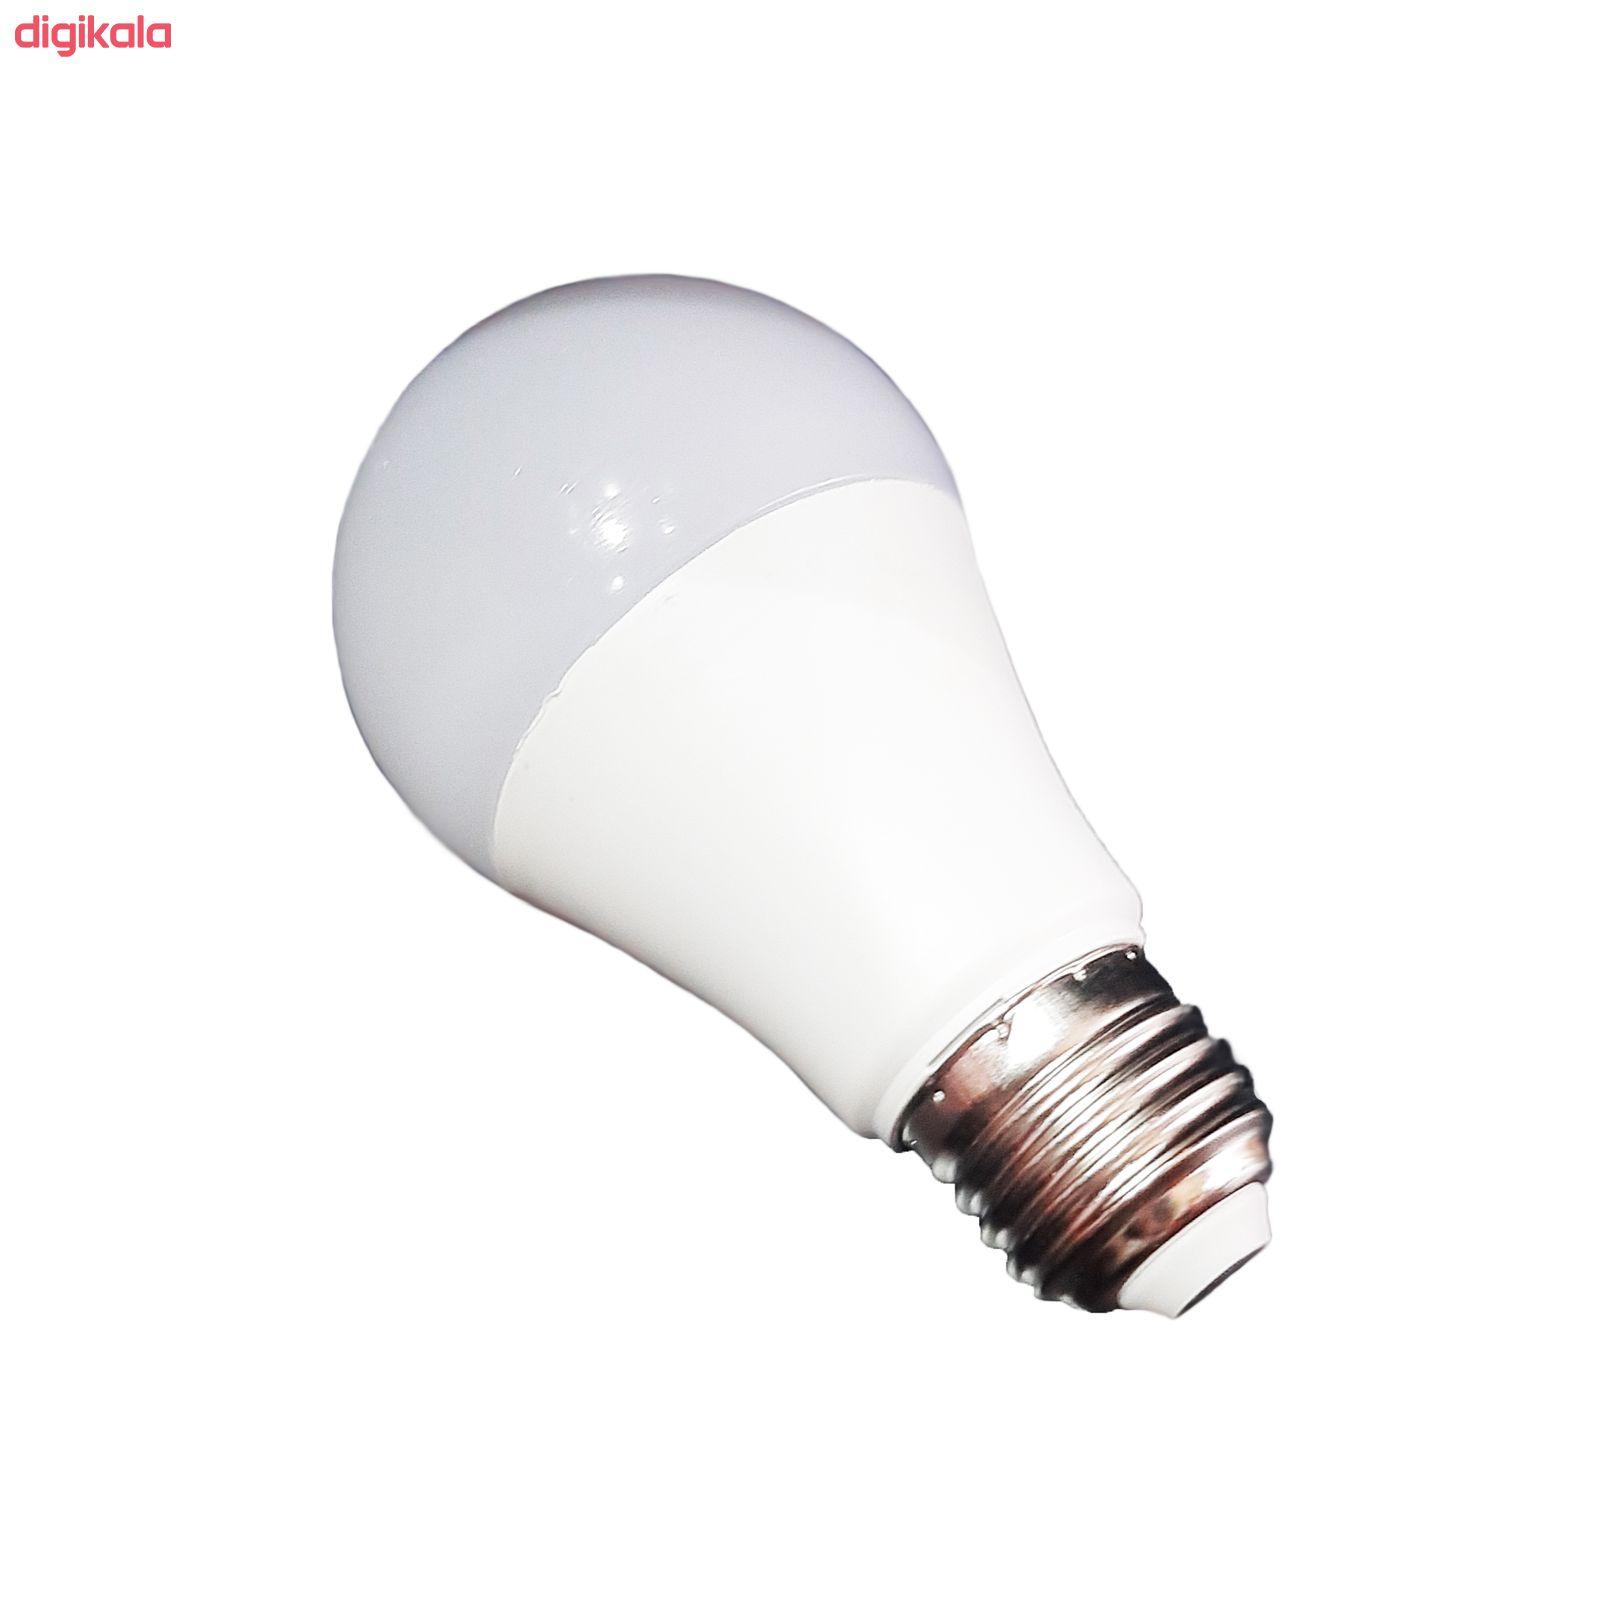 لامپ ال ای دی 9 وات گلدن نور مدل gn9 پایه E27 main 1 1